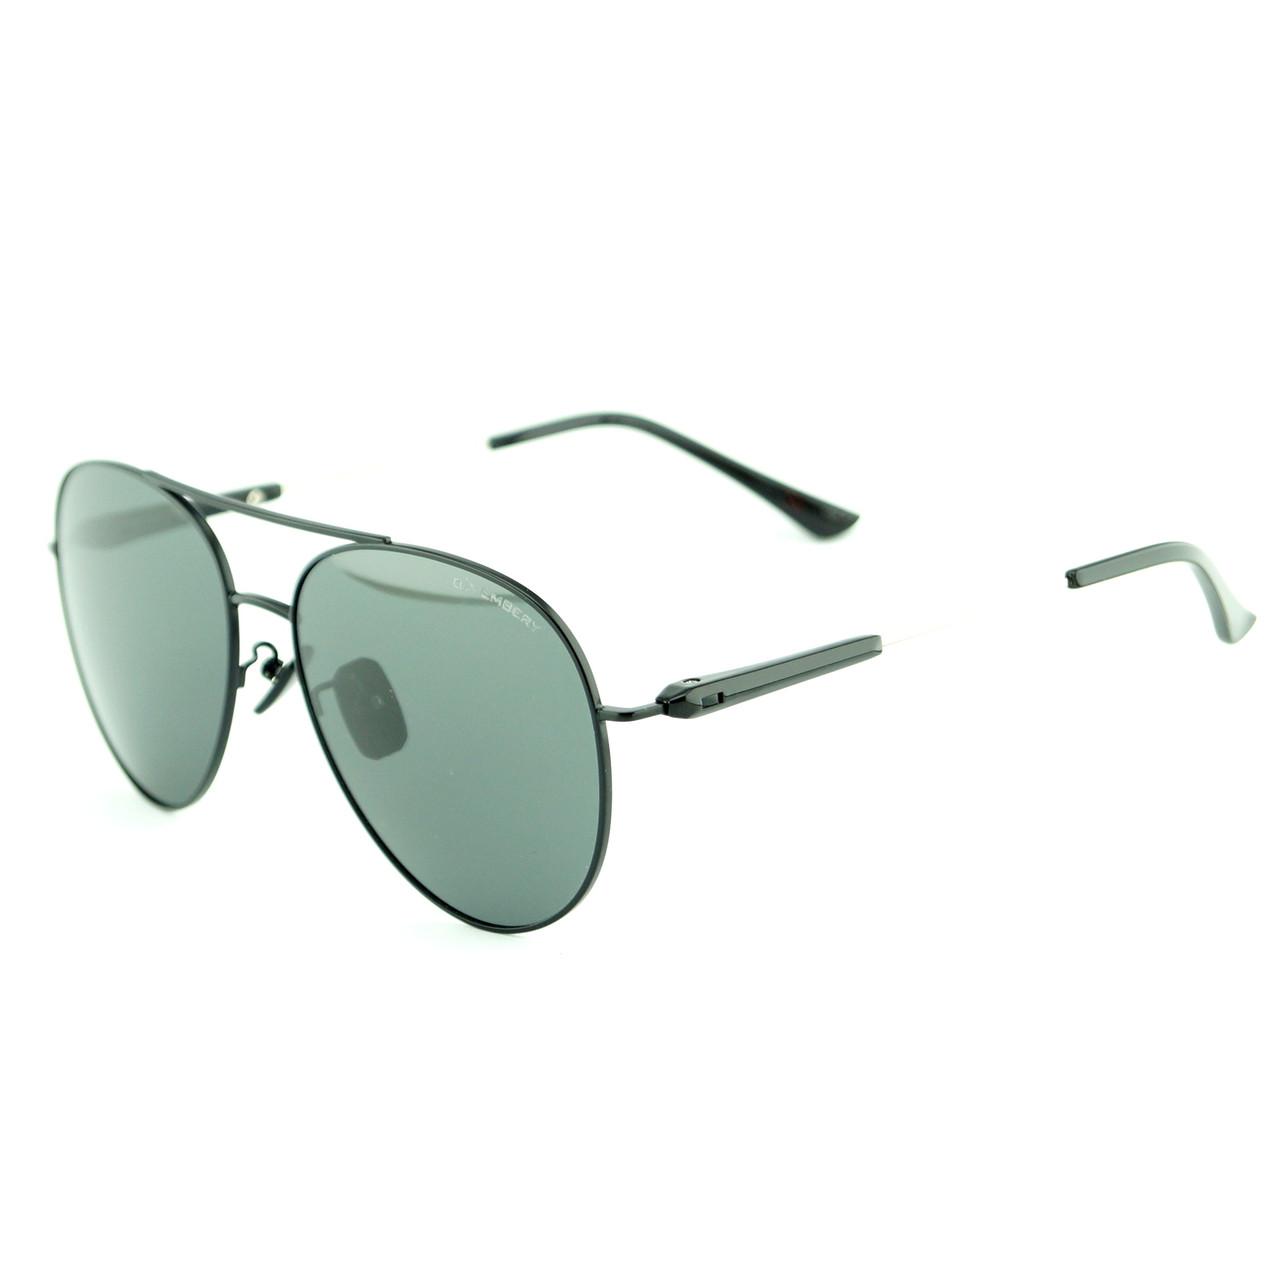 Солнцезащитные очки Oxembery 1126